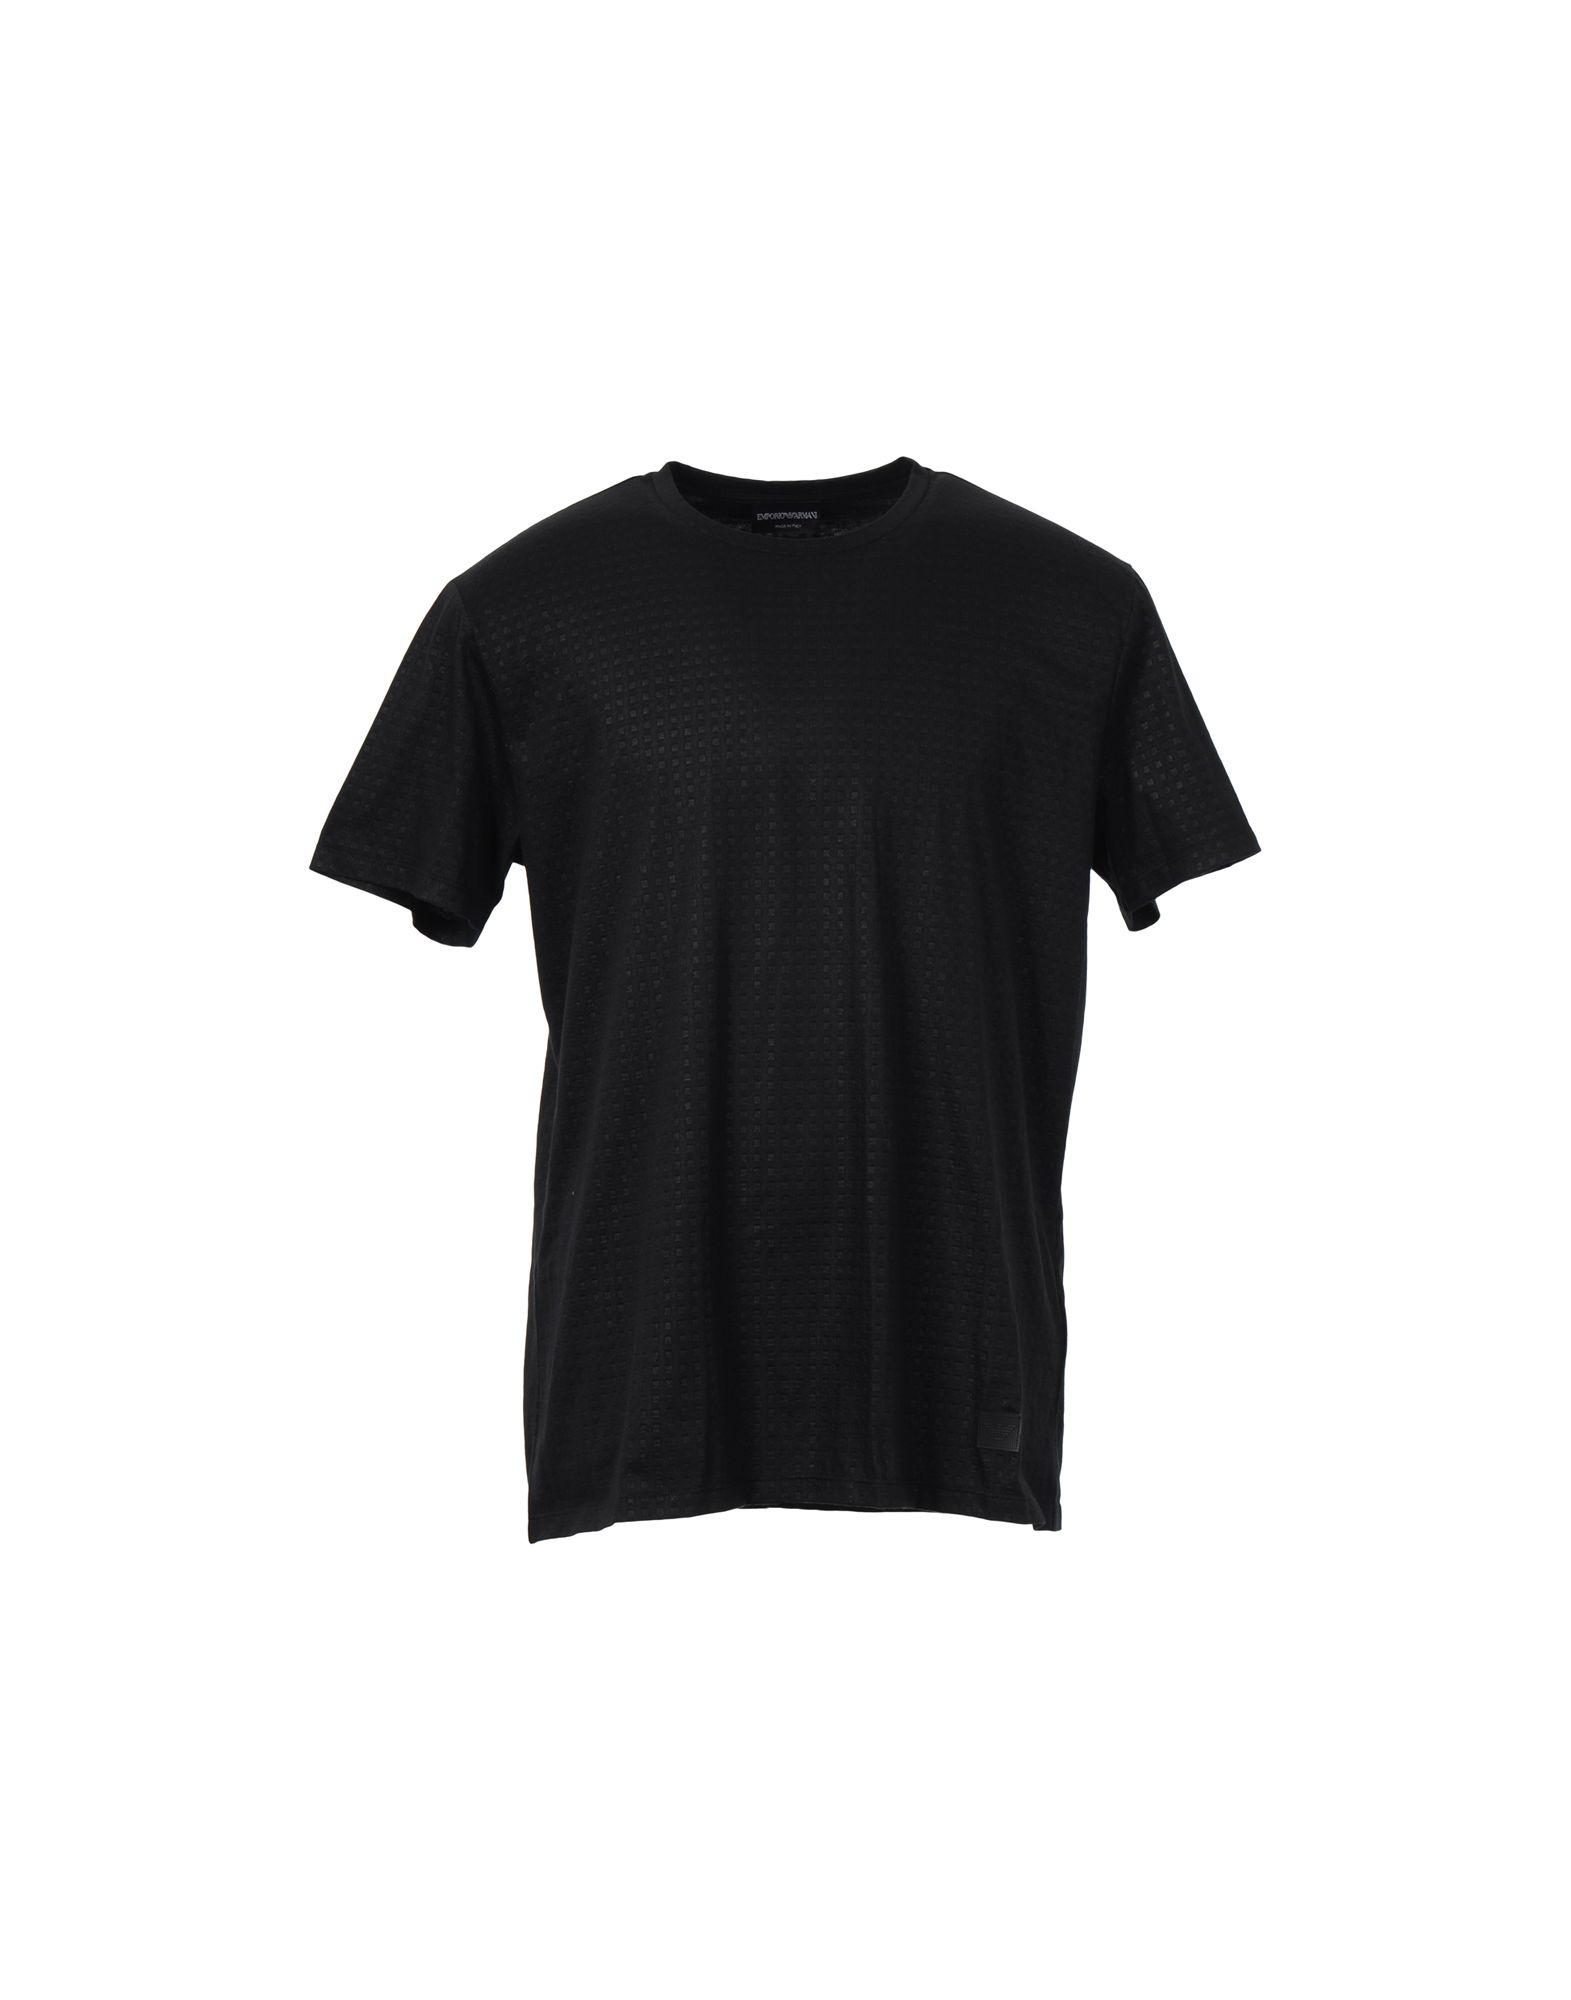 Emporio armani t shirt in black for men save 67 lyst for Black armani t shirt